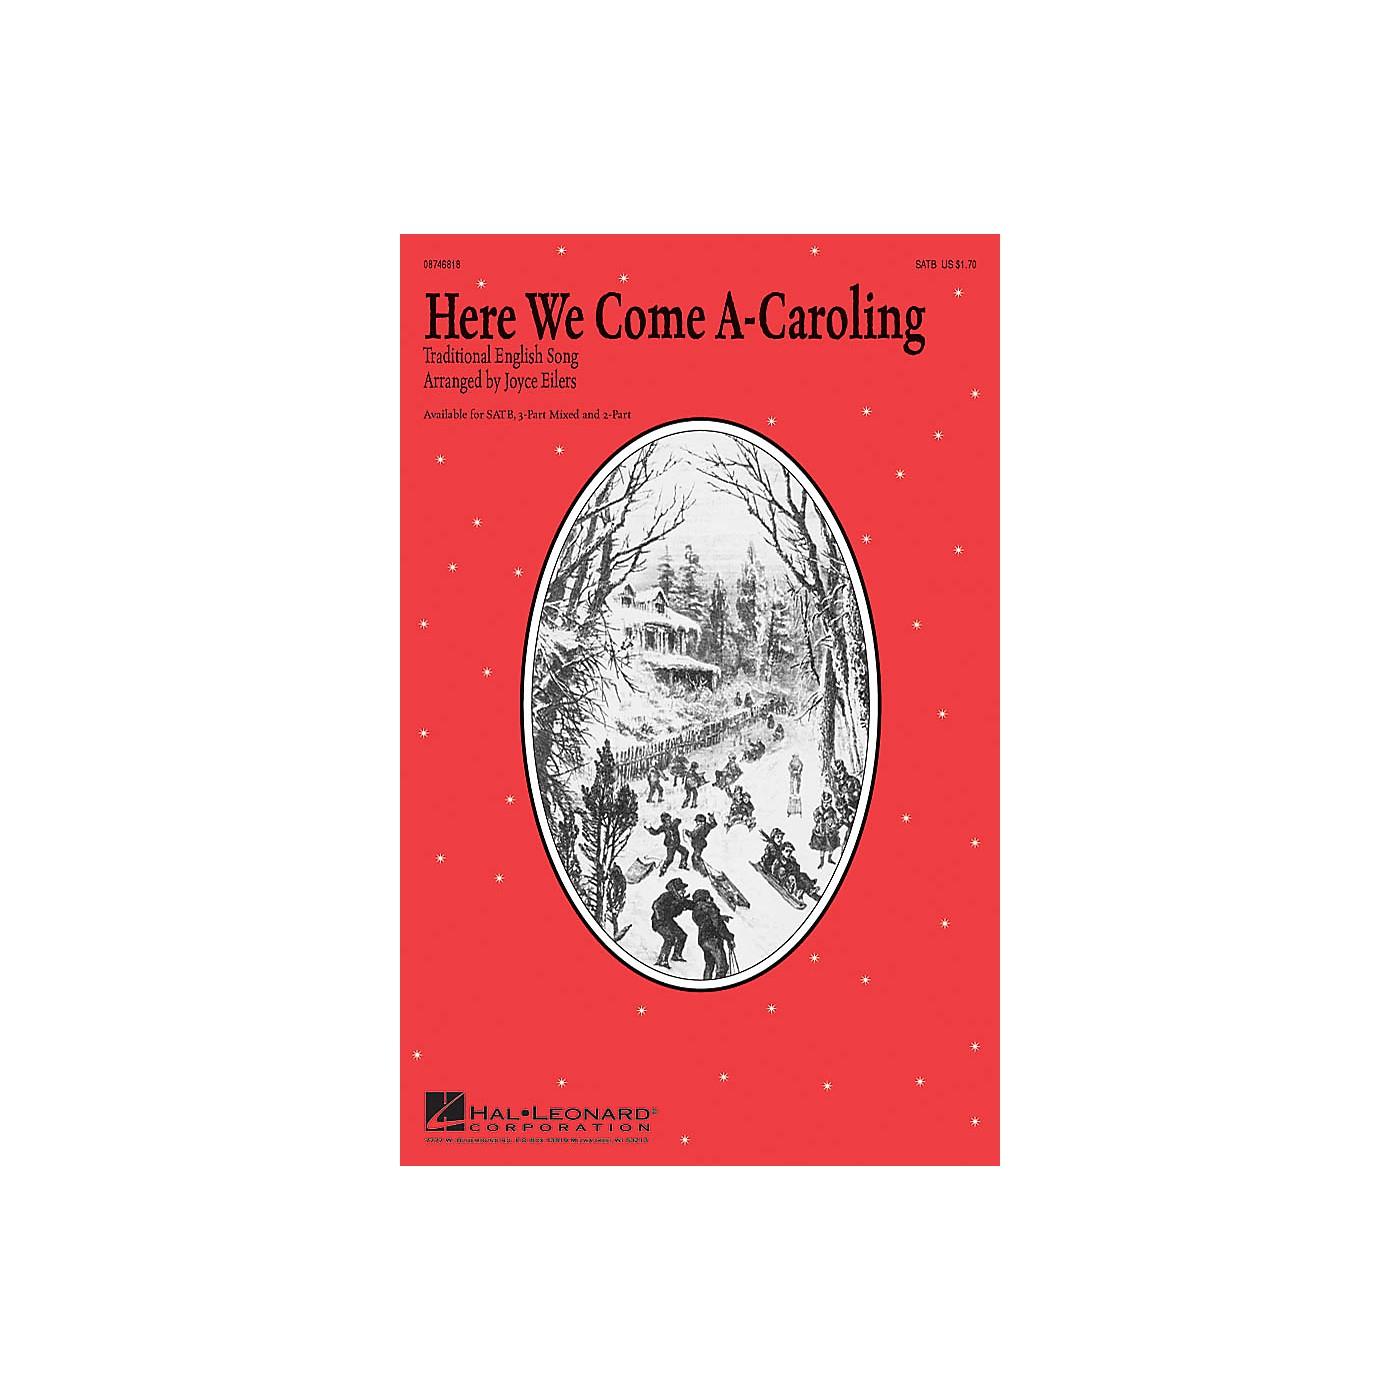 Hal Leonard Here We Come A-Caroling SATB arranged by Joyce Eilers thumbnail